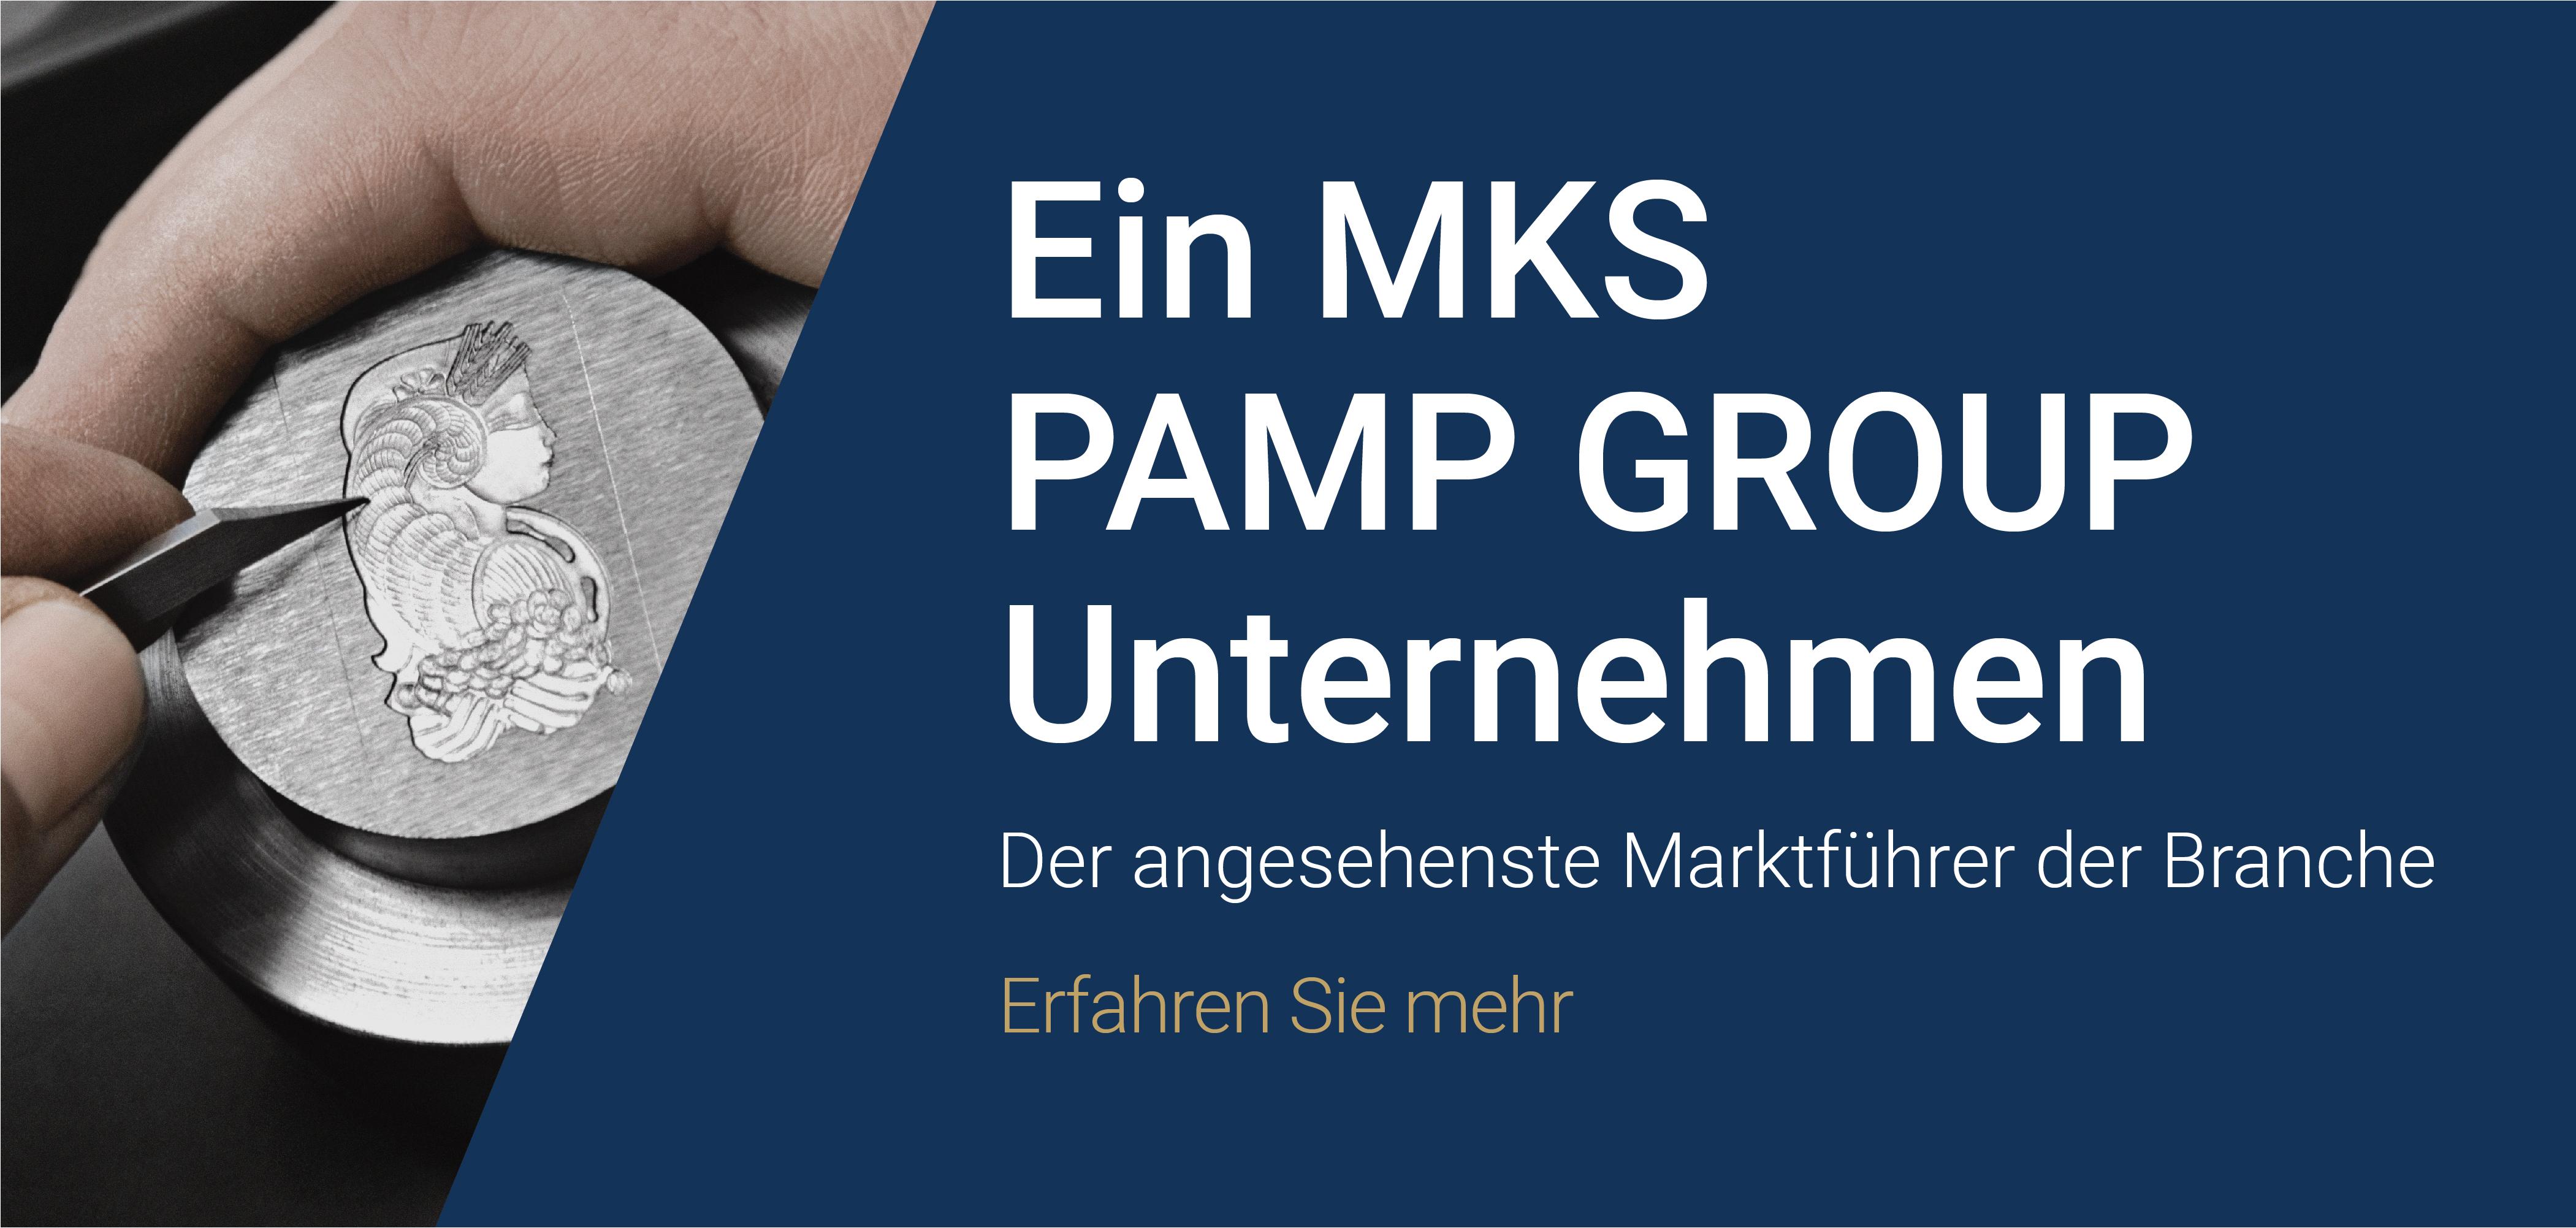 MKS PAMP GROUP